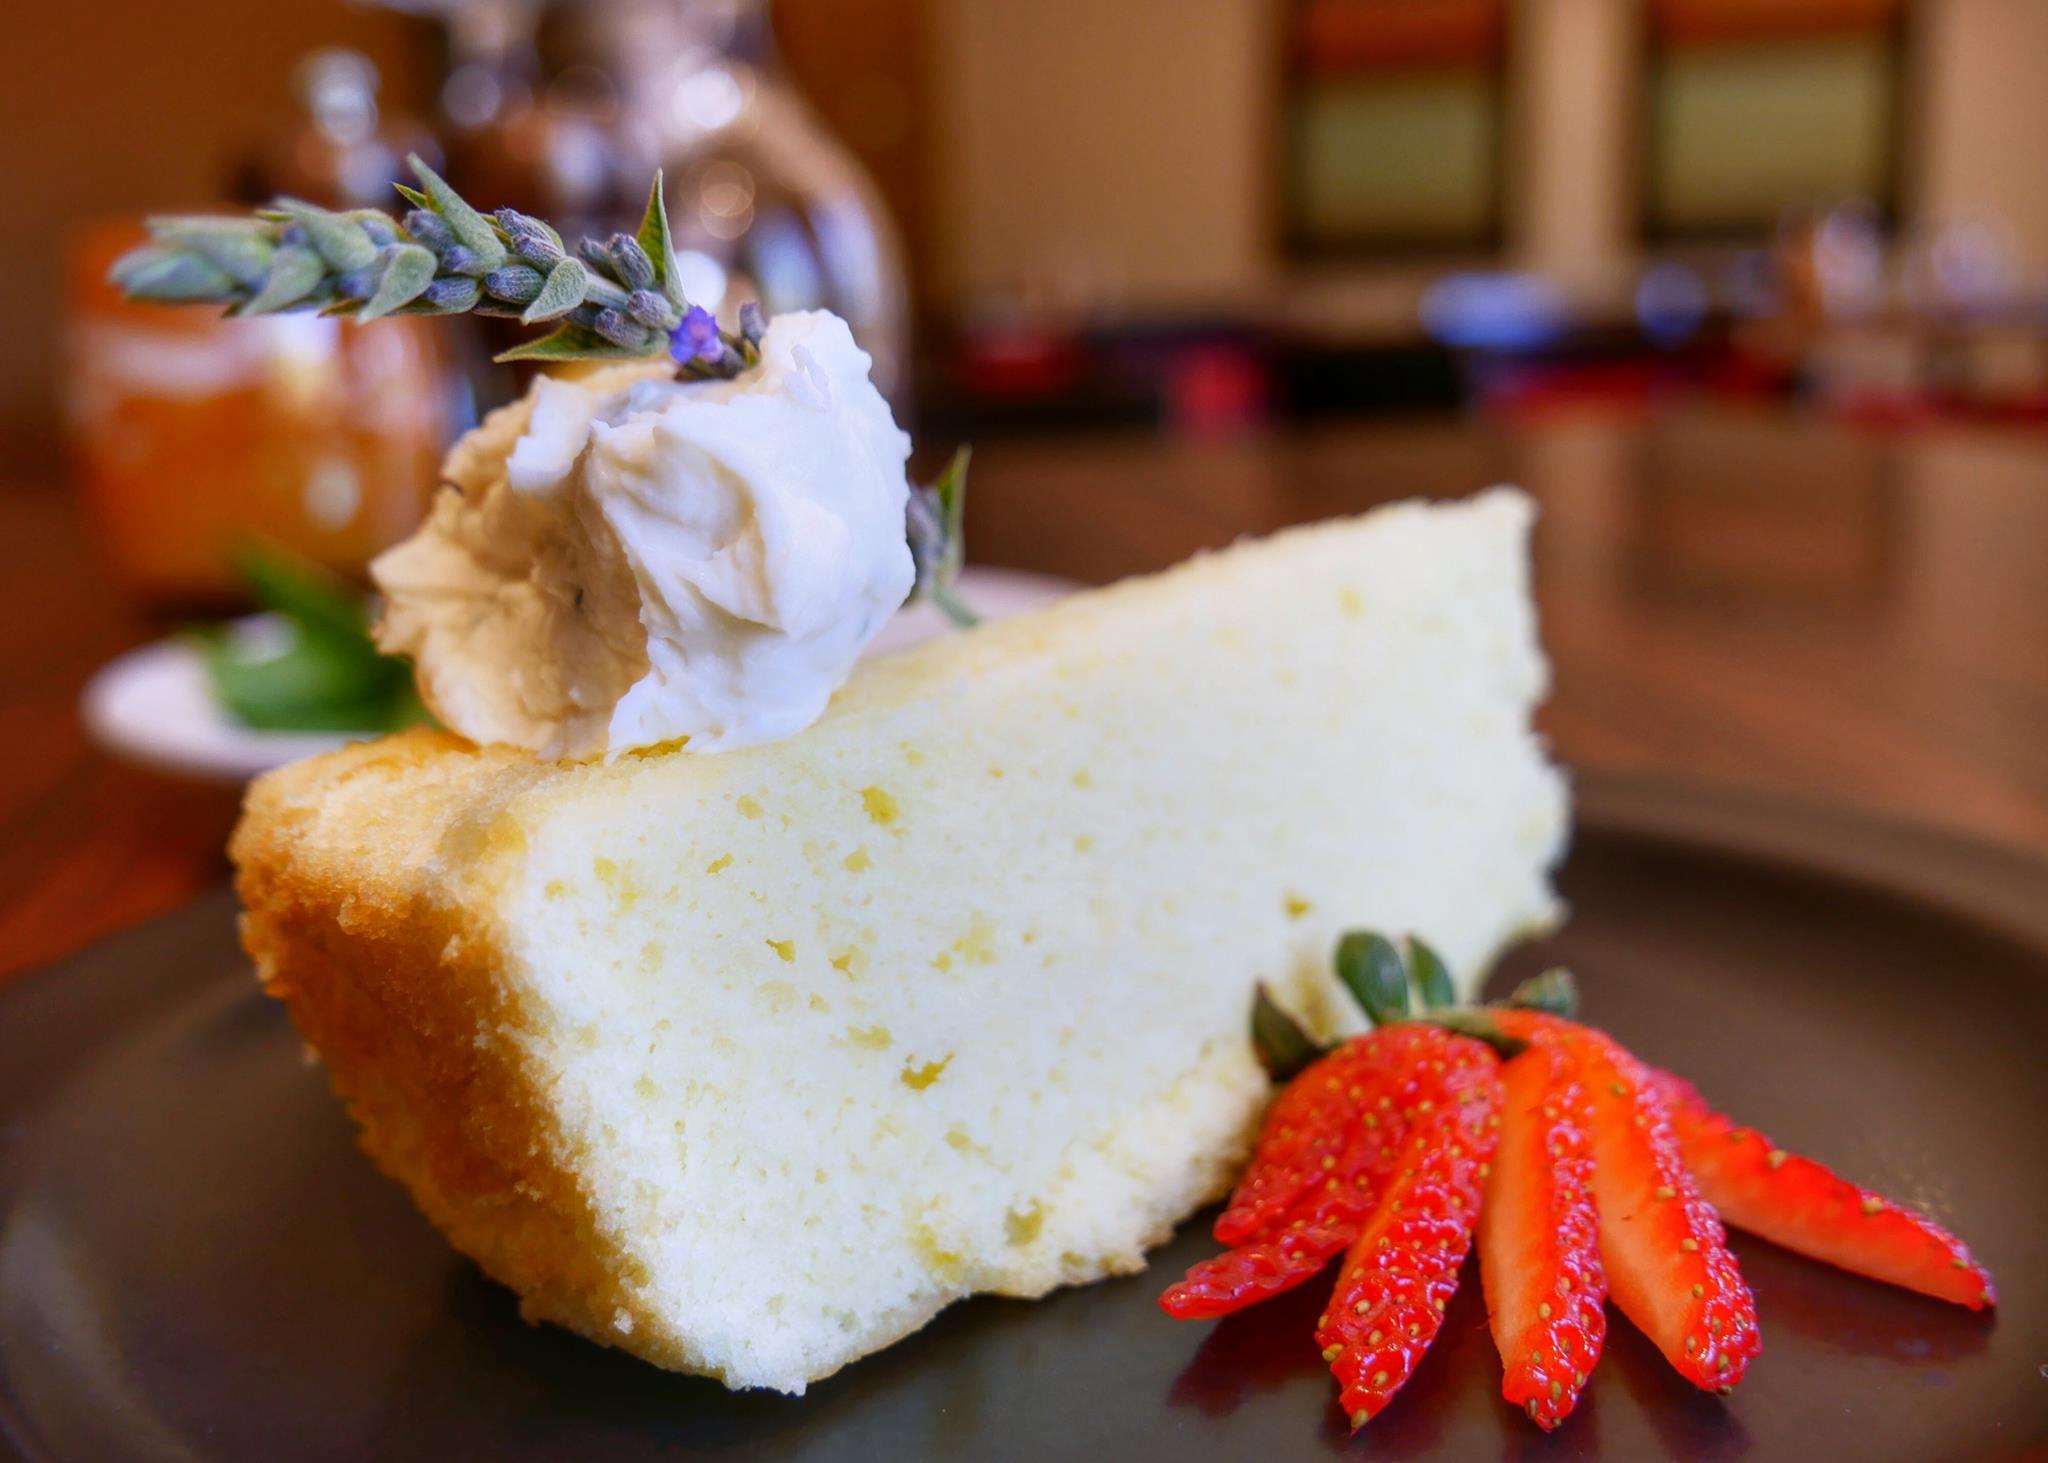 Italian Lemon Chiffon Cake